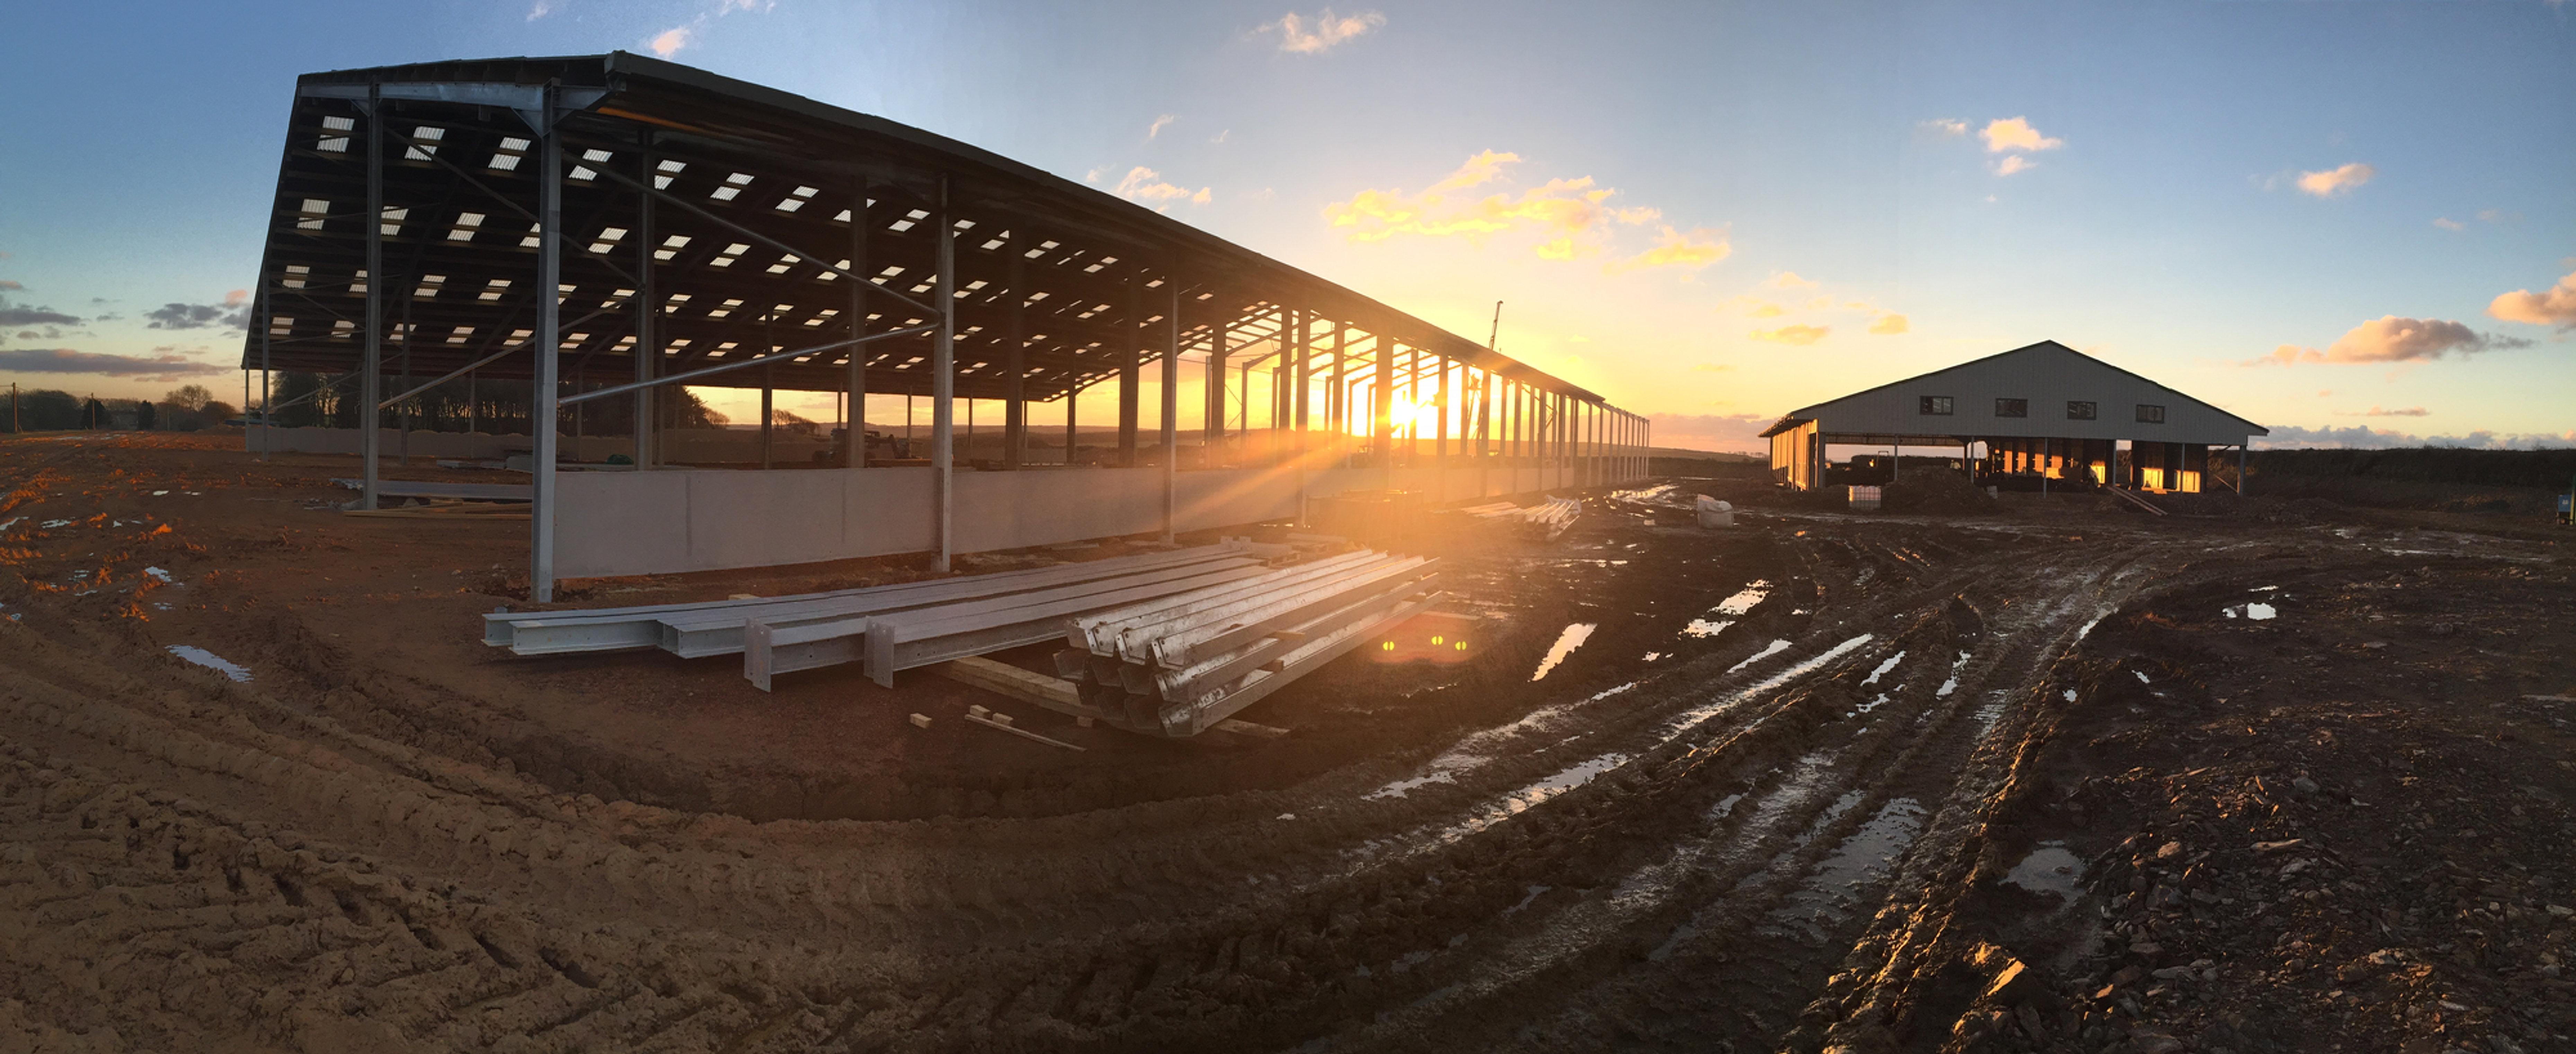 New dairy farm under construction